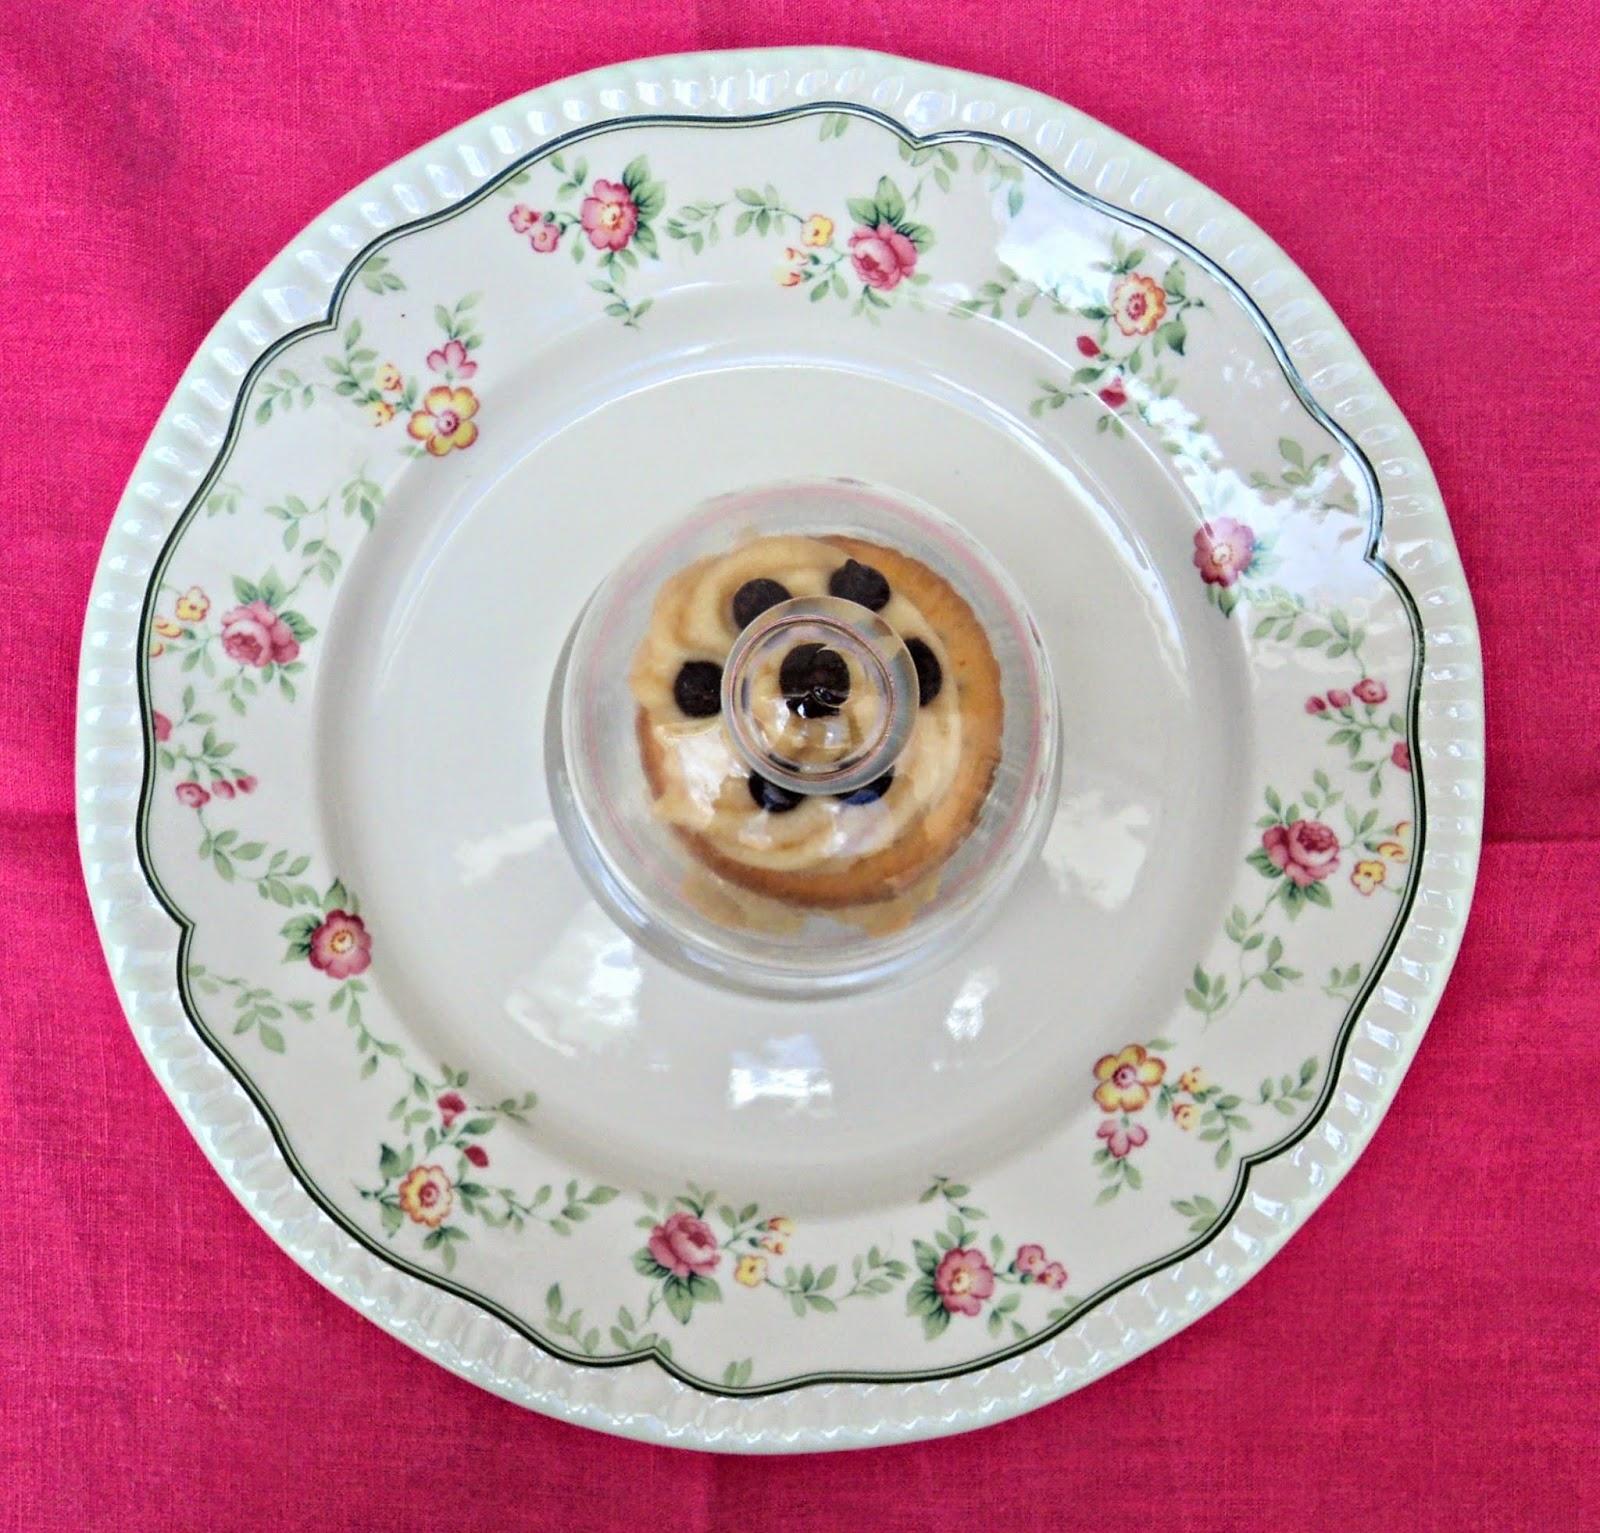 tarta-galletas-principe-crema-presentacion